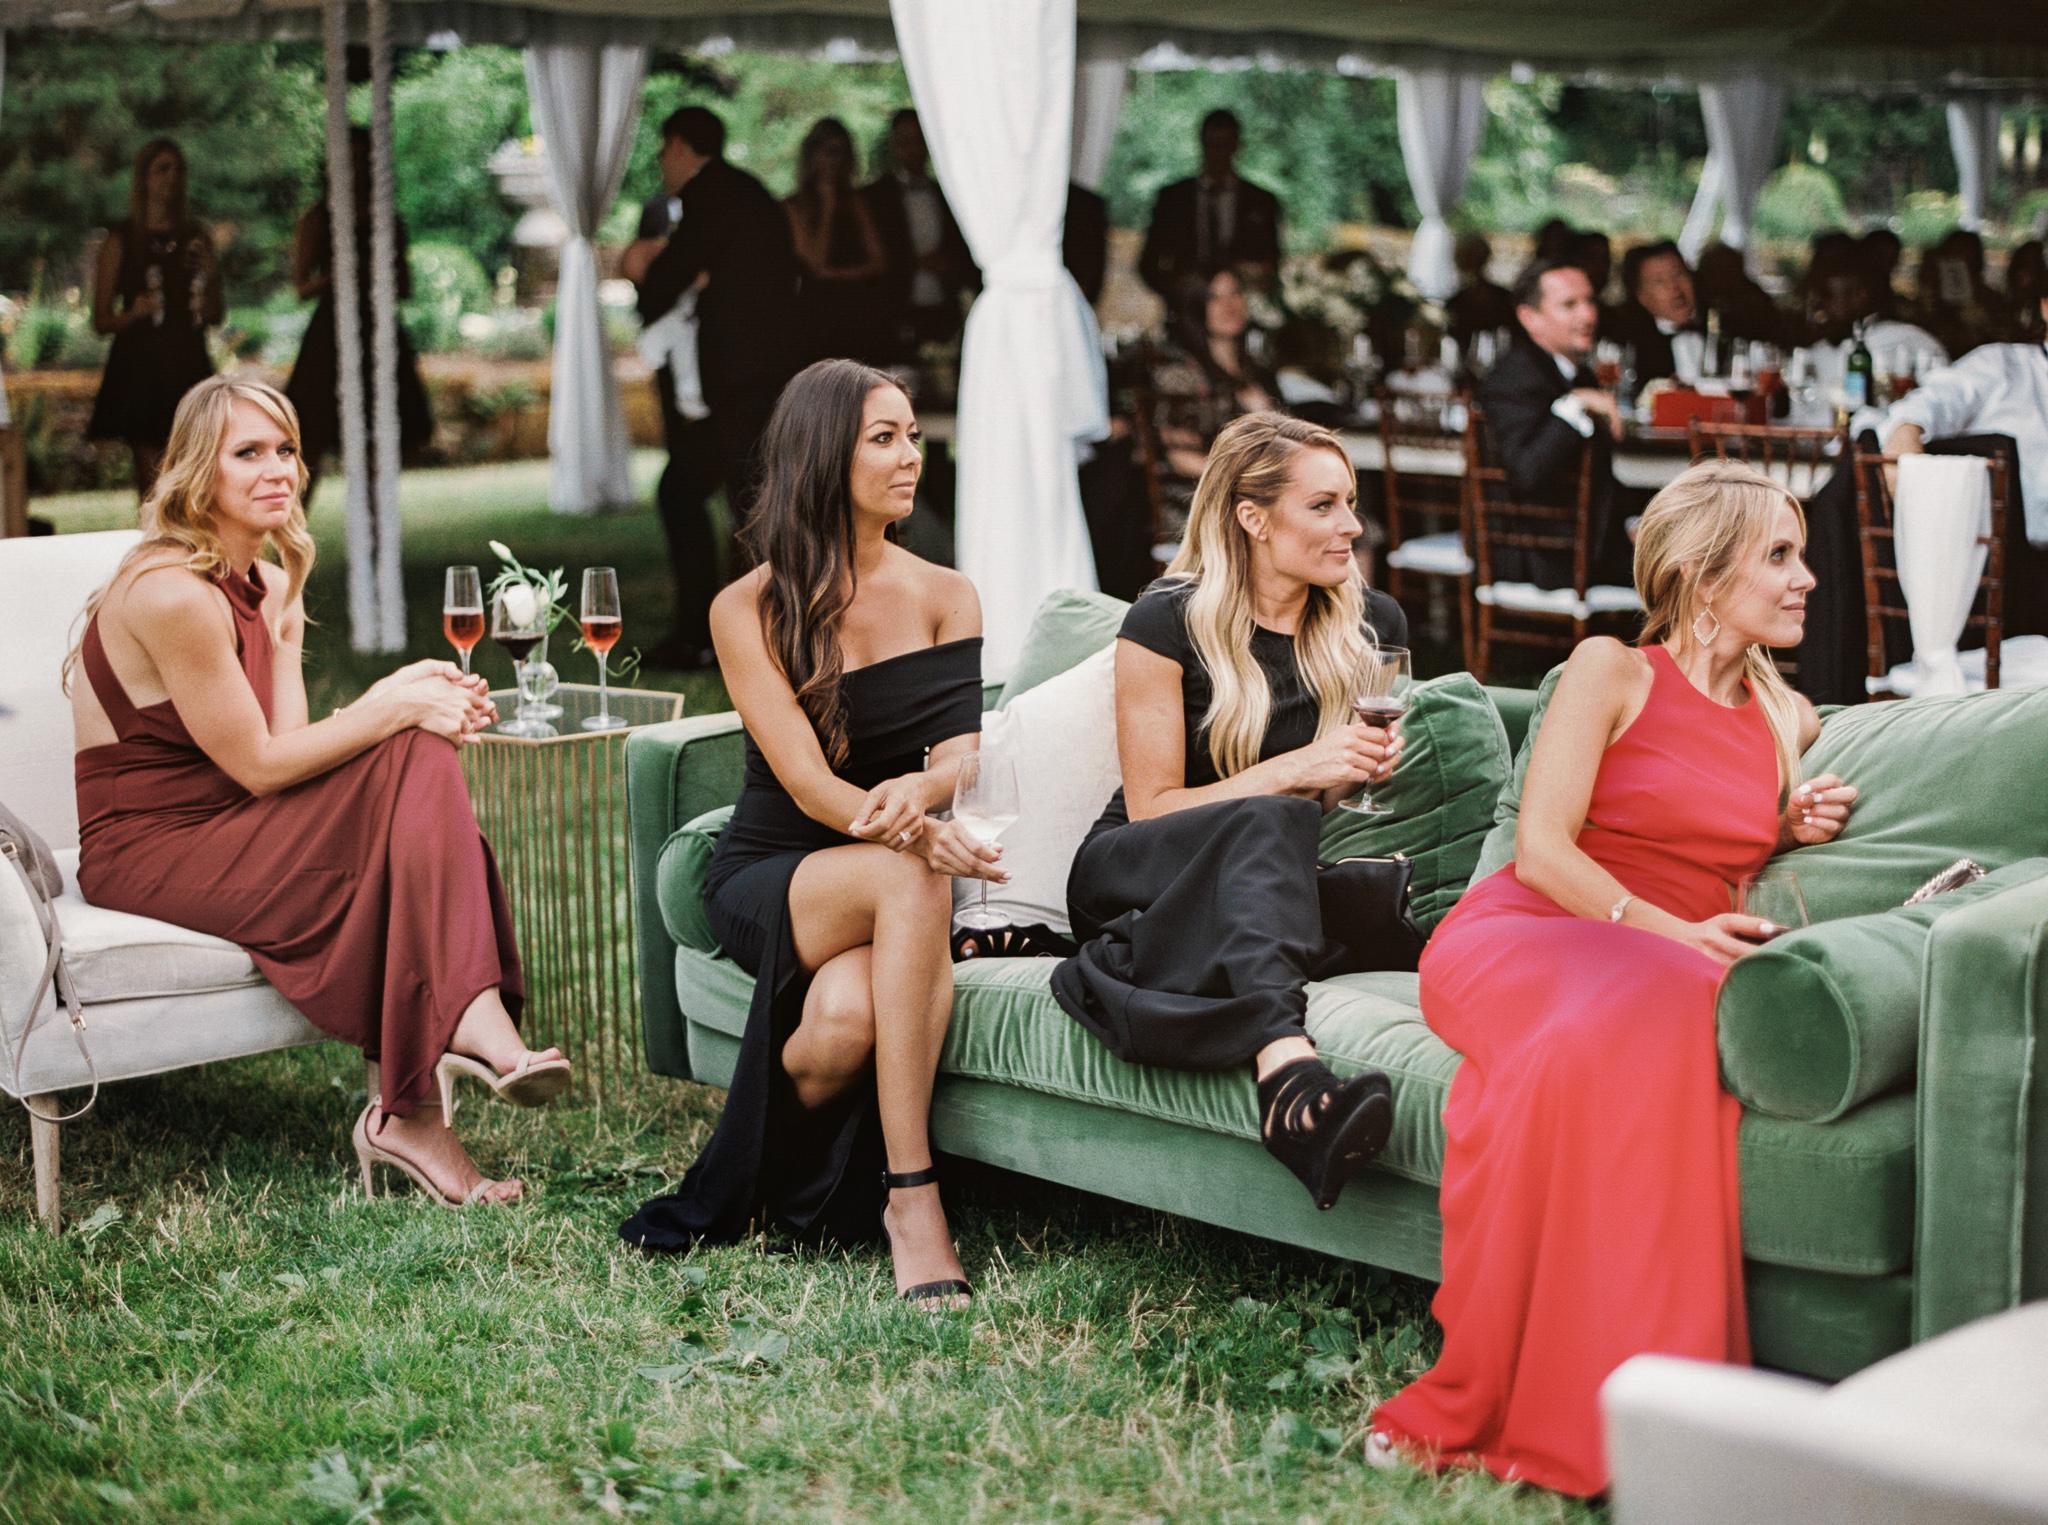 209OutliveCreative_Travel_Photographer_Videographer_Lewis&Clark_Oregon_Elegant_BlackTie_Destination_Wedding.jpg